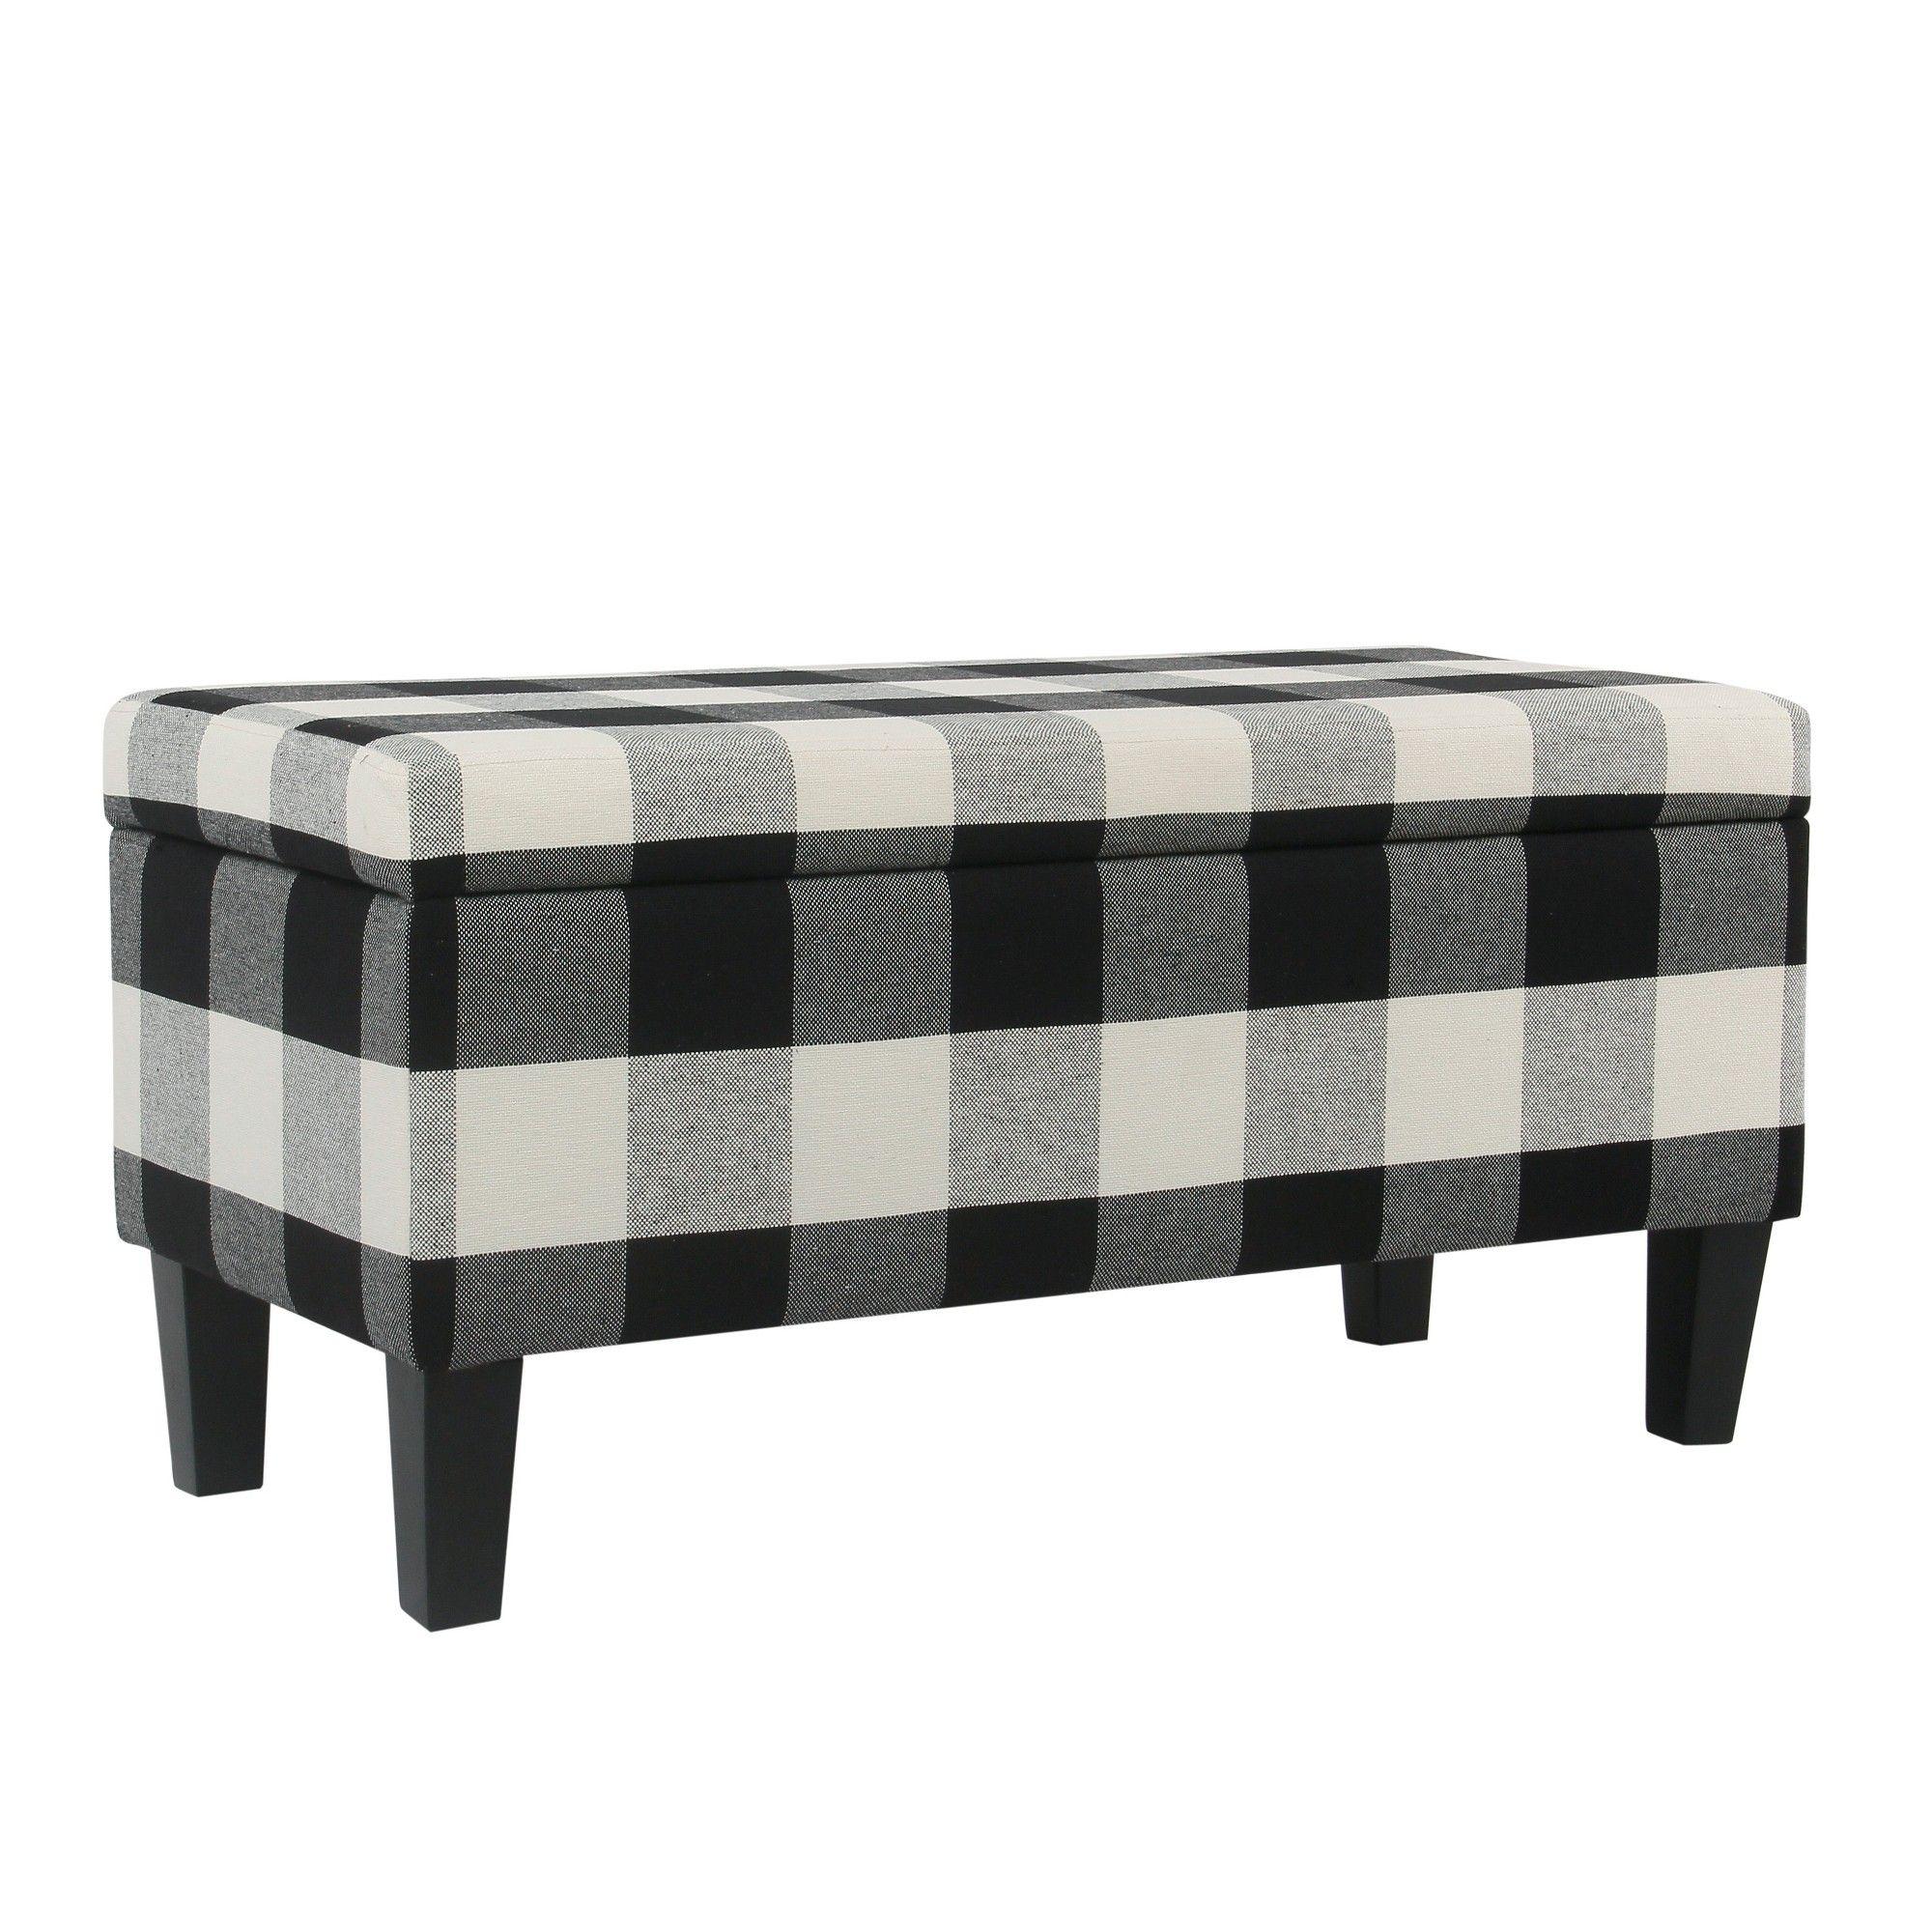 Beau Large Decorative Storage Bench Black Plaid   Homepop